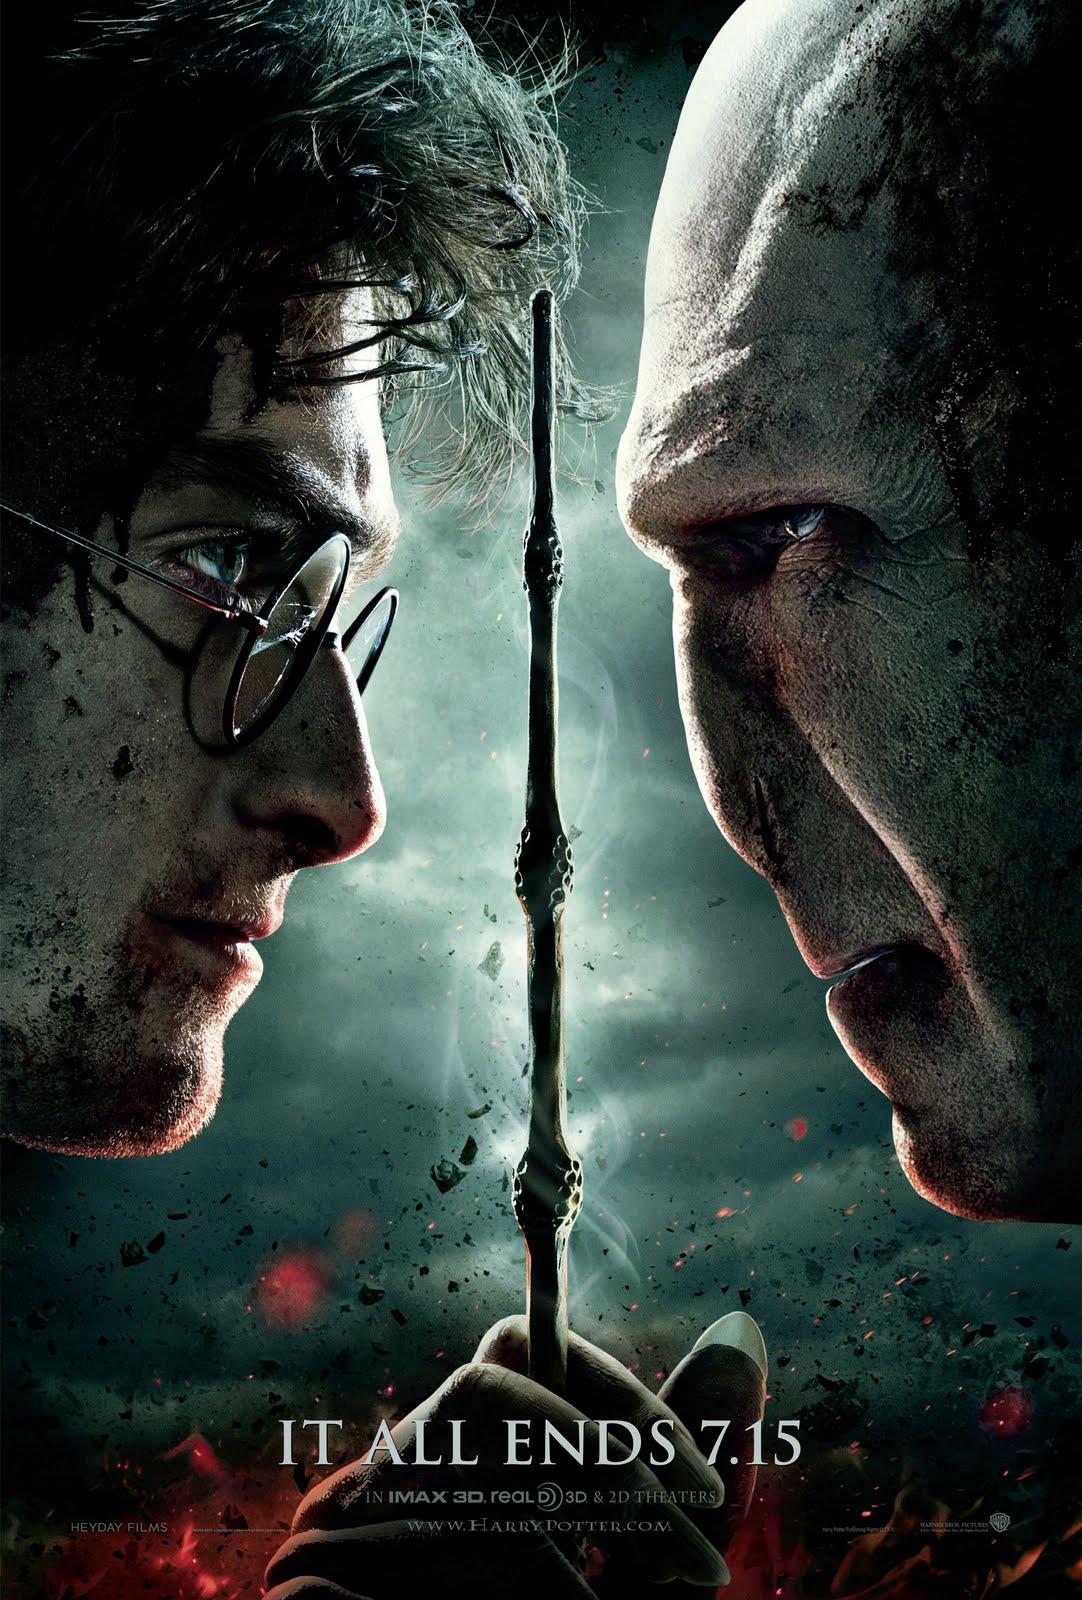 http://3.bp.blogspot.com/-IiTbXqhQ9bY/TZXLsxESprI/AAAAAAAAAcw/NIKA9ZeMjgc/s1600/Harry+Potter+last+film+poster.jpg